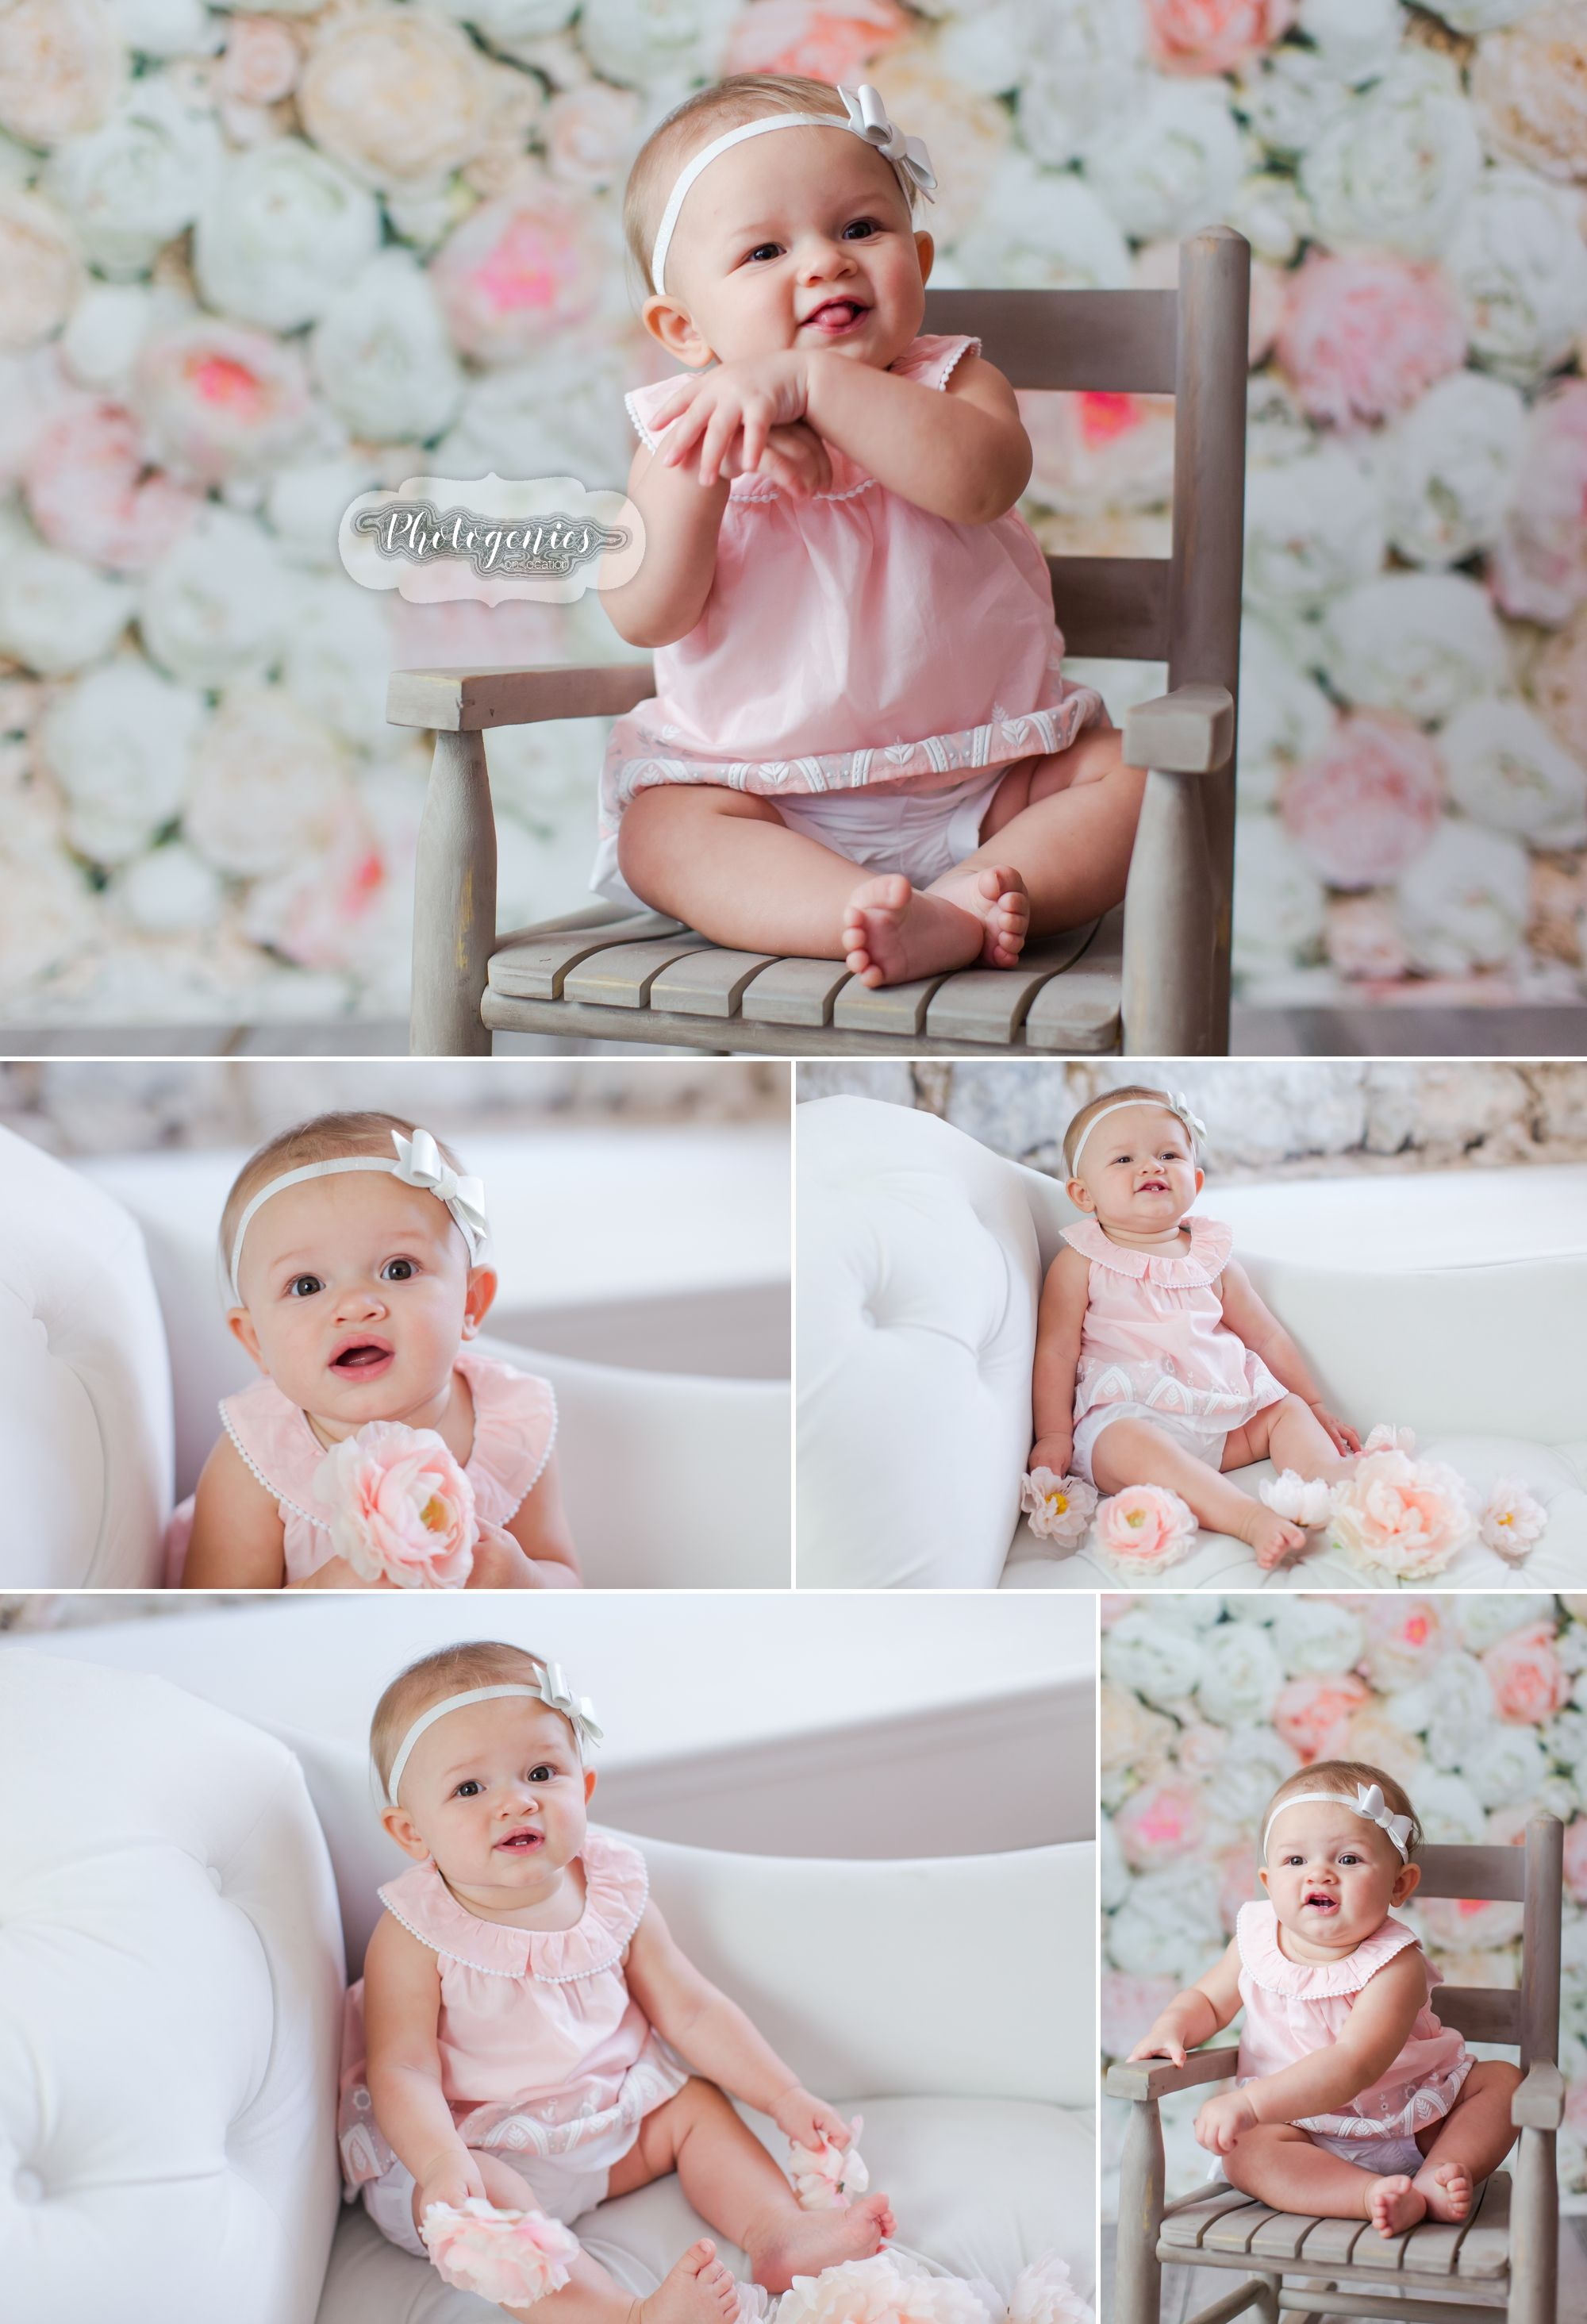 Baby Girl Photoshoot Ideas : photoshoot, ideas, Ava's, Sitting-Up-Session, Girly, Six-Month, Photo, Shoot, Photoshoot, Girl,, Photoshoot,, Pictures